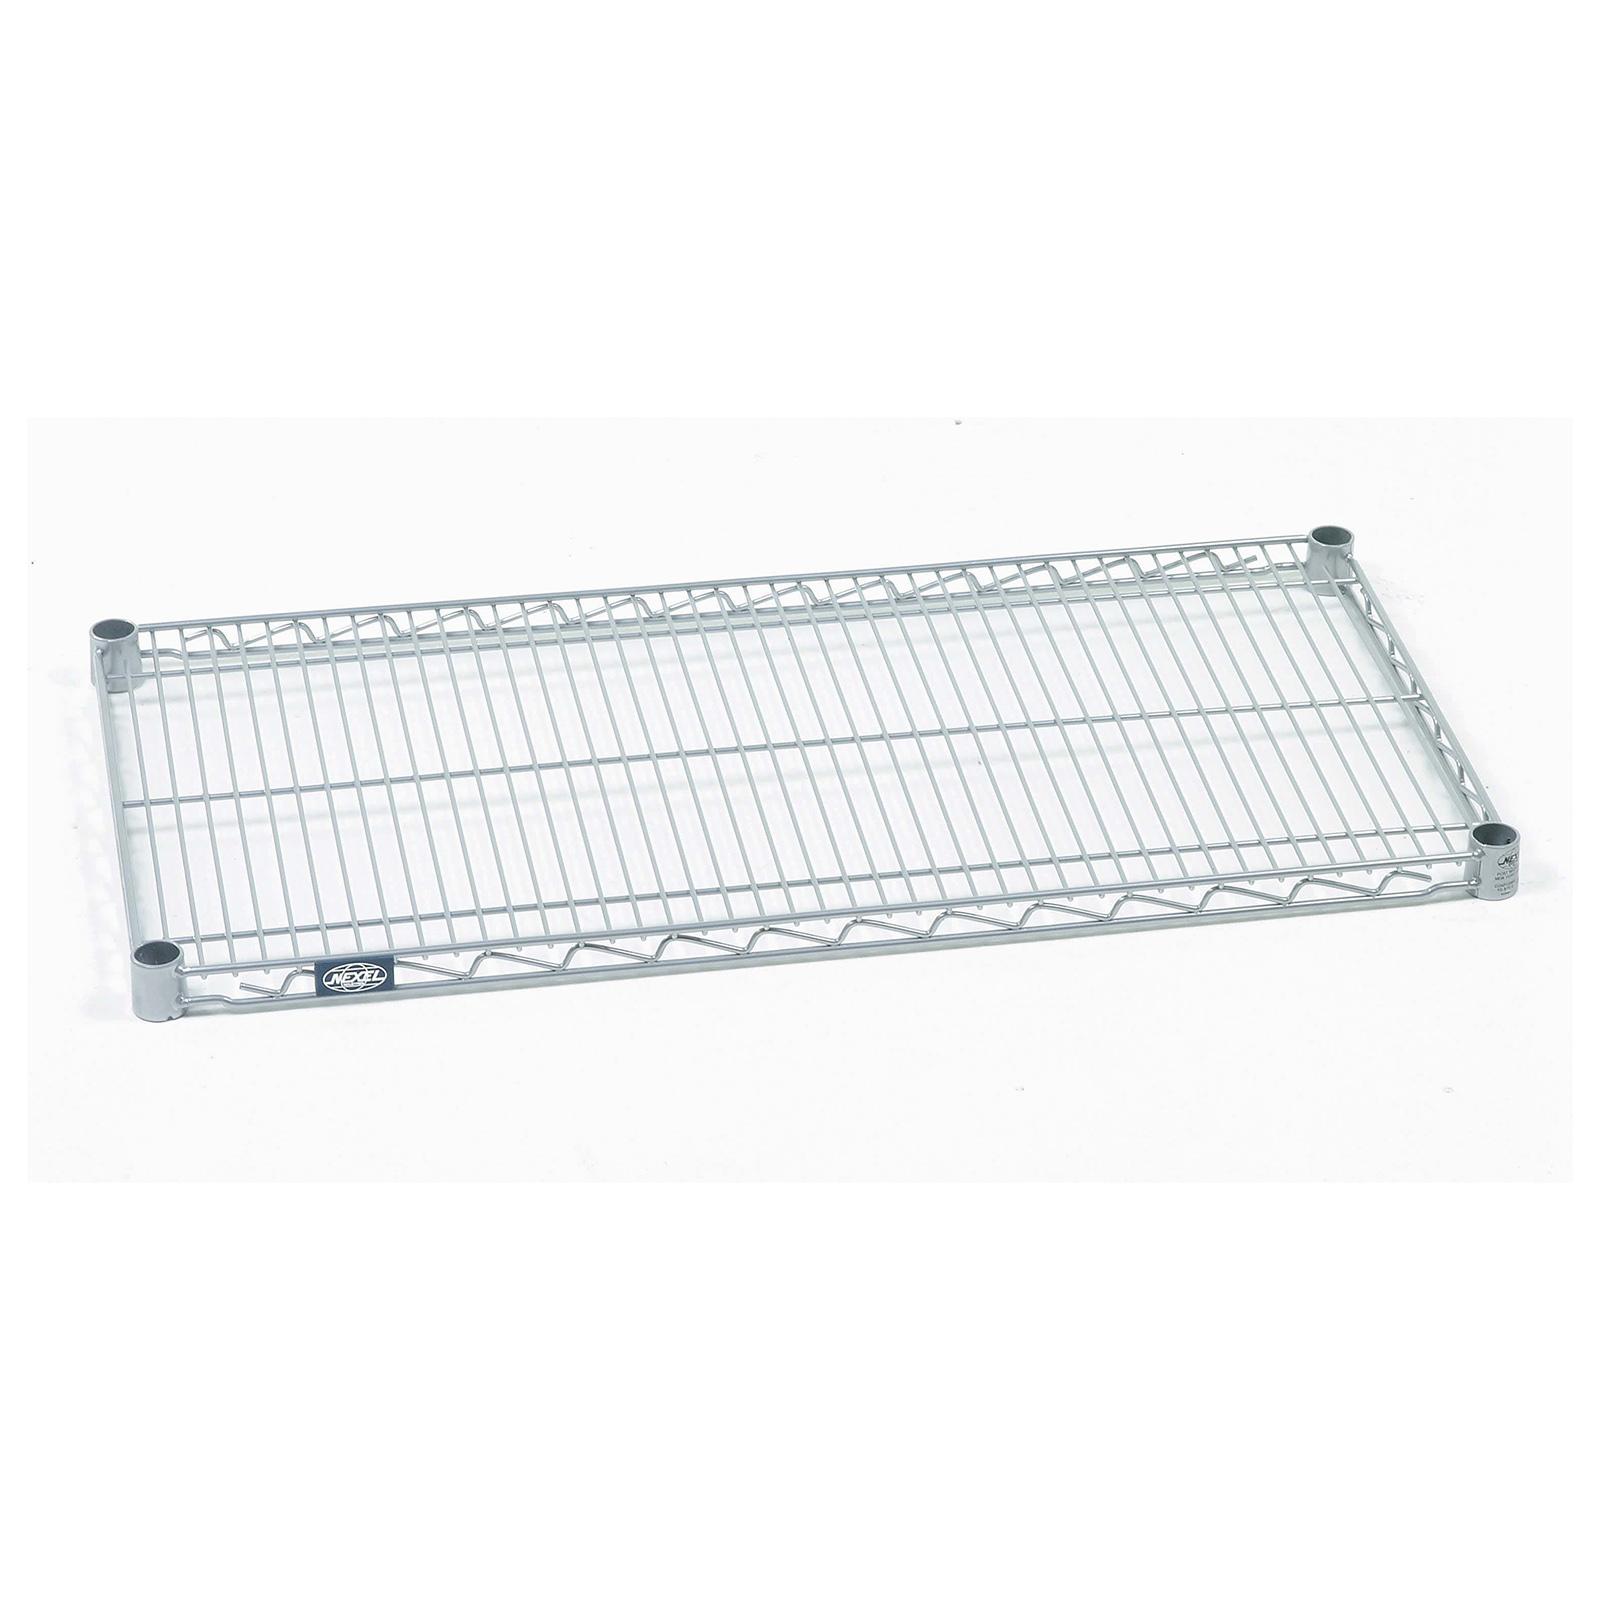 Nexel S1430EP wire shelves